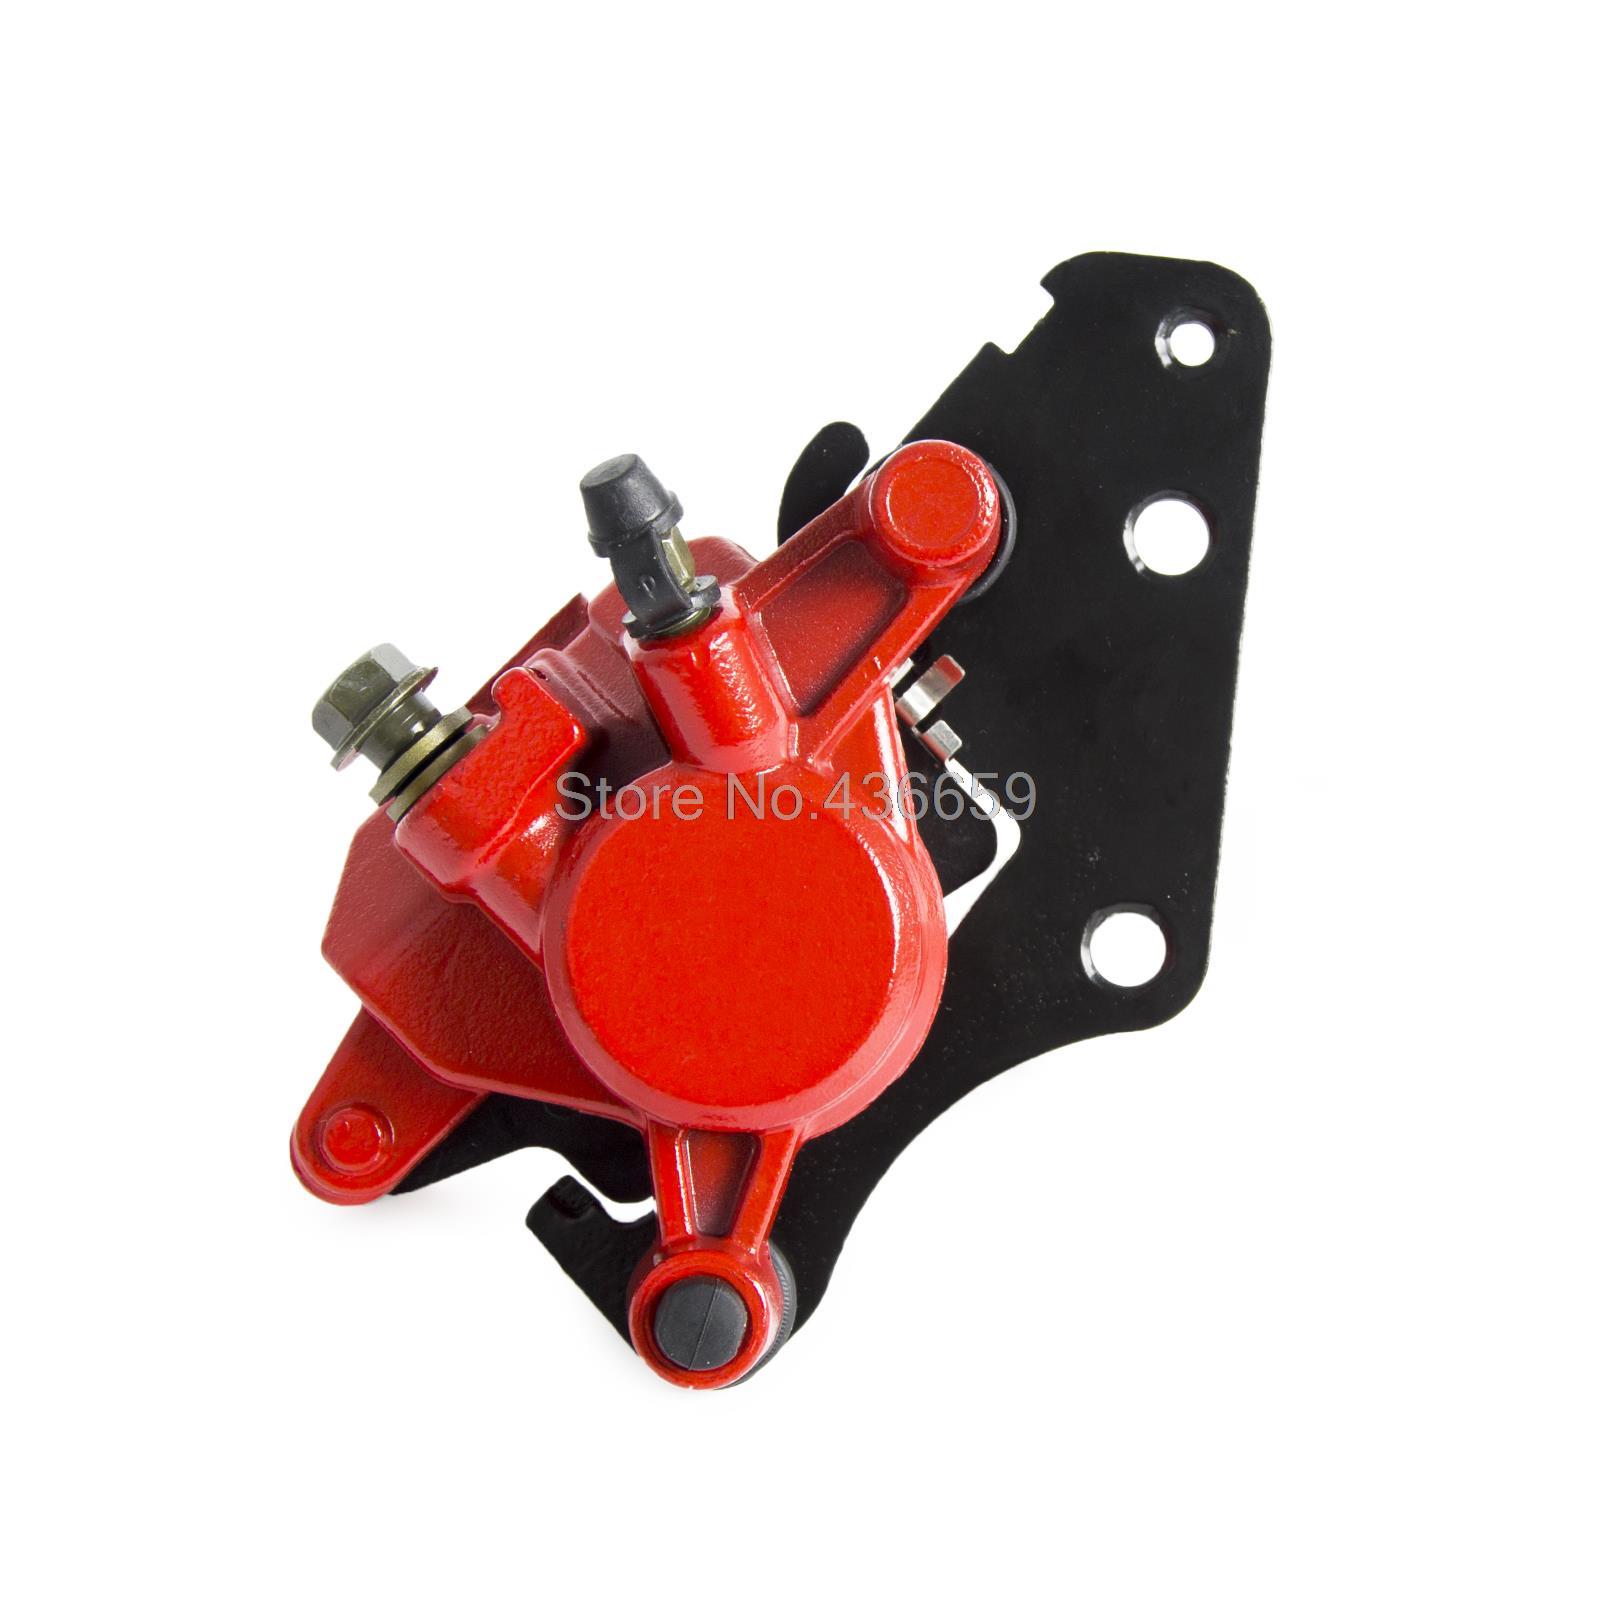 Brake Caliper Assy With Pads For Yamaha XC125E  32P-F580U-11-00 brake caliper assy with pads for yamaha xc125e axis treet e53j 2009 2013 210 2011 2012 number 32p f580u 11 00